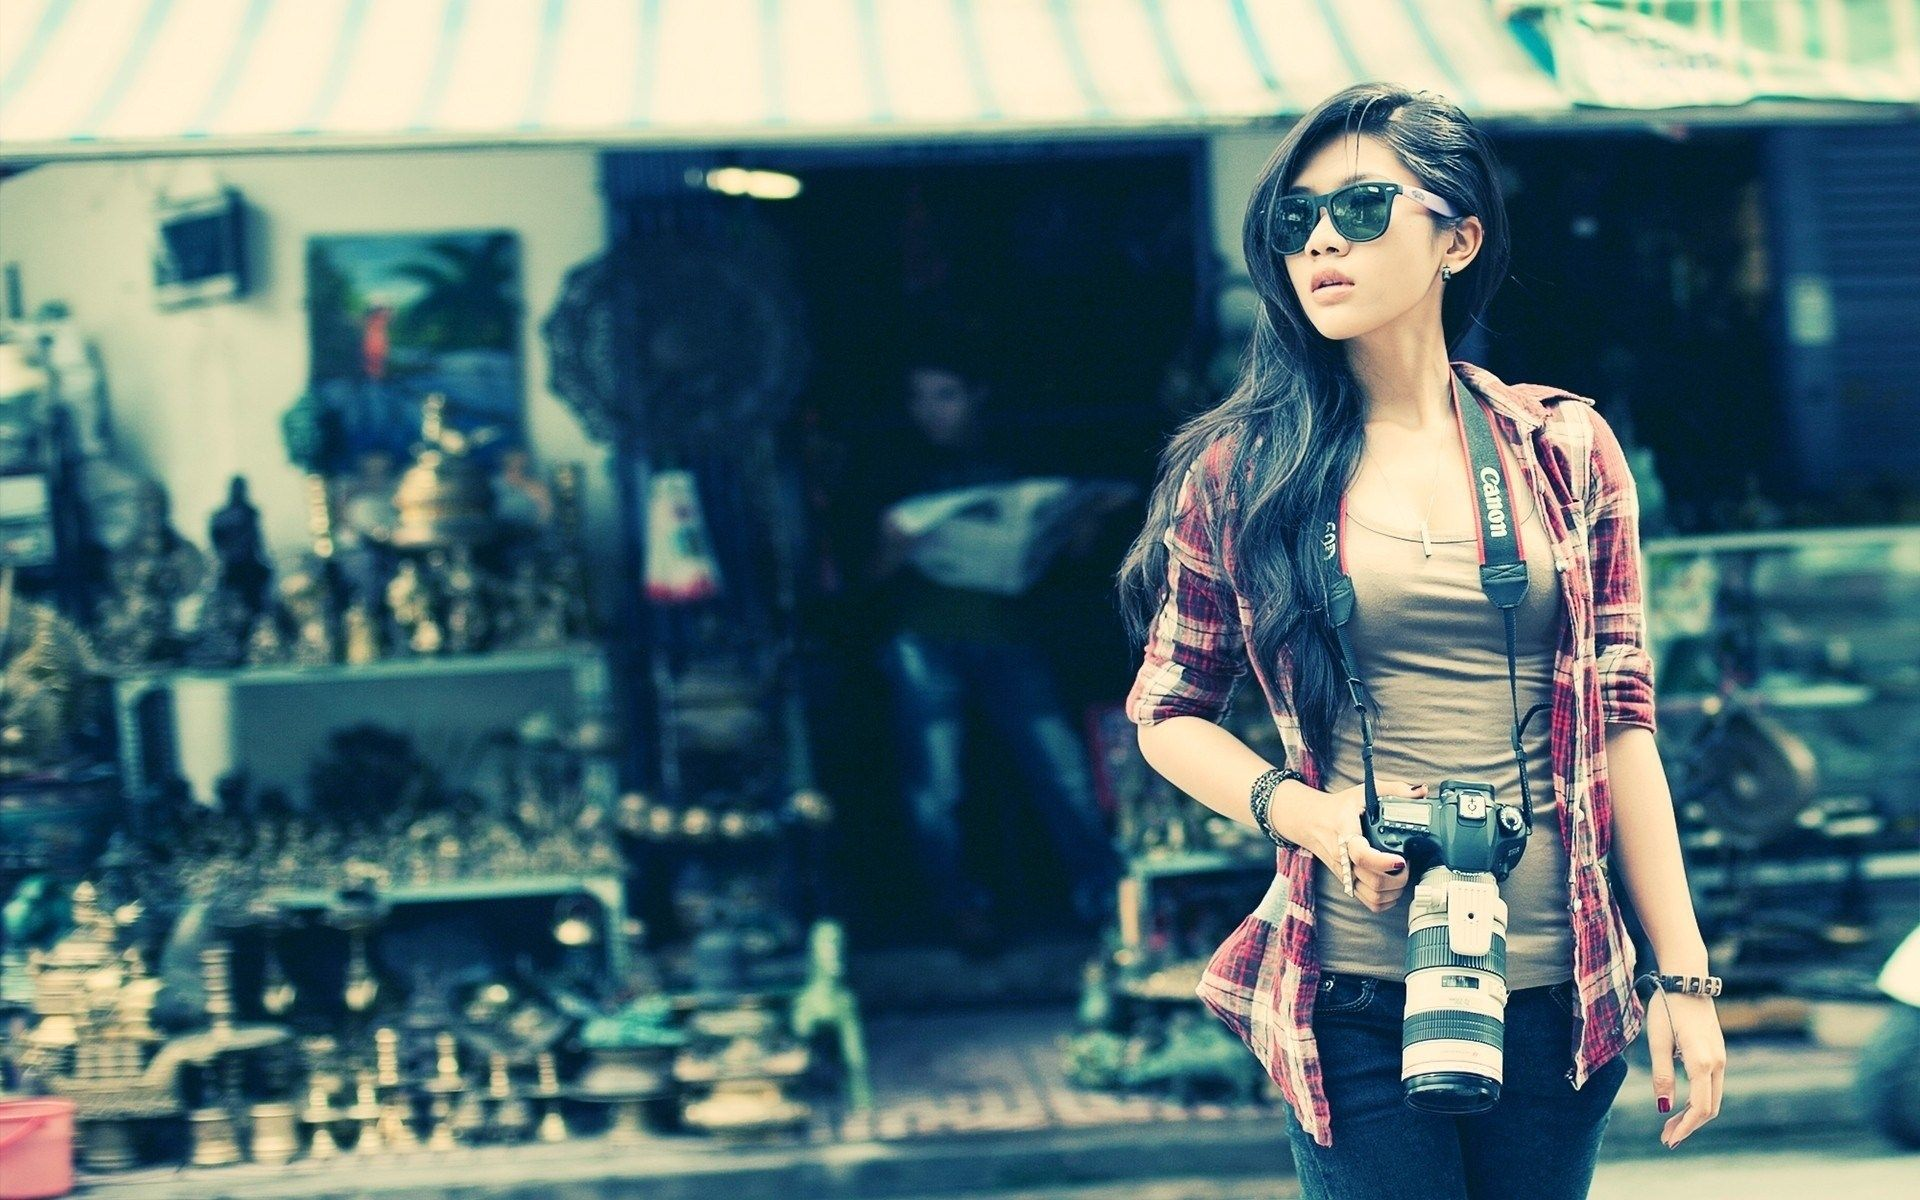 Beautiful Girl Tele Lens On Canon Dslr Wide Hd Wallpaper Cool